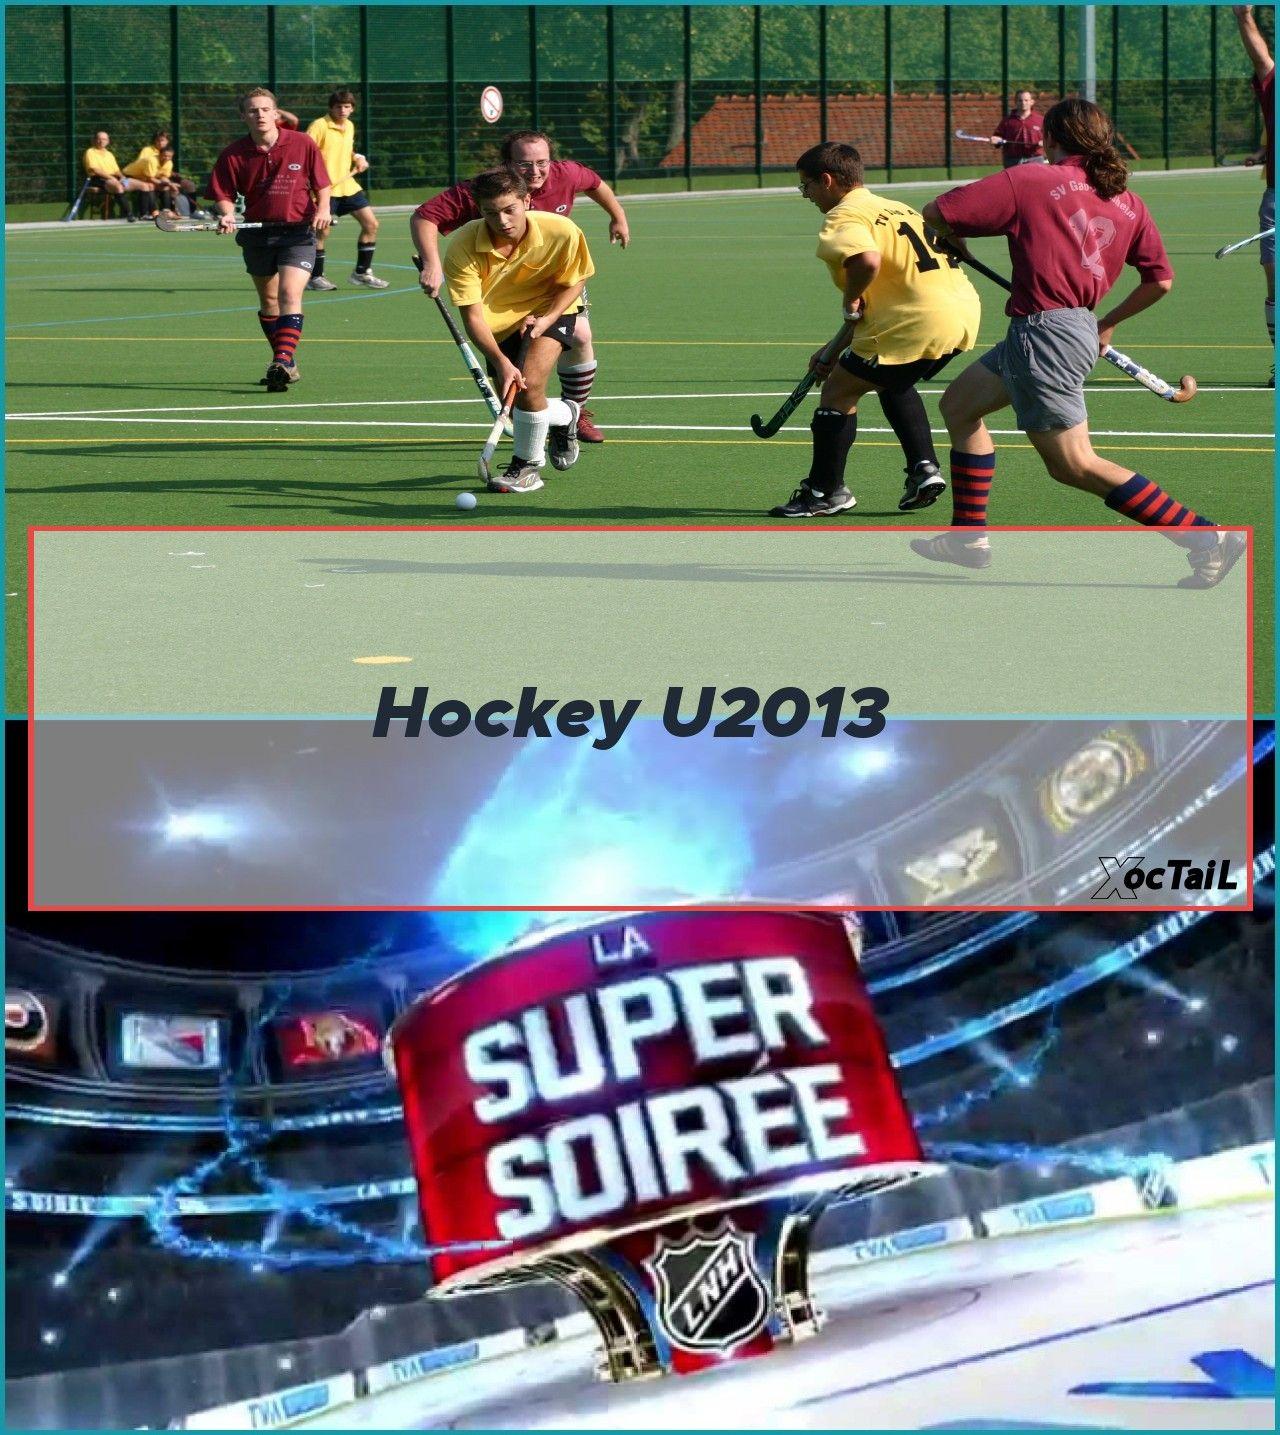 Hockey u2013 tva super sports soiree hockey open в 2020 г